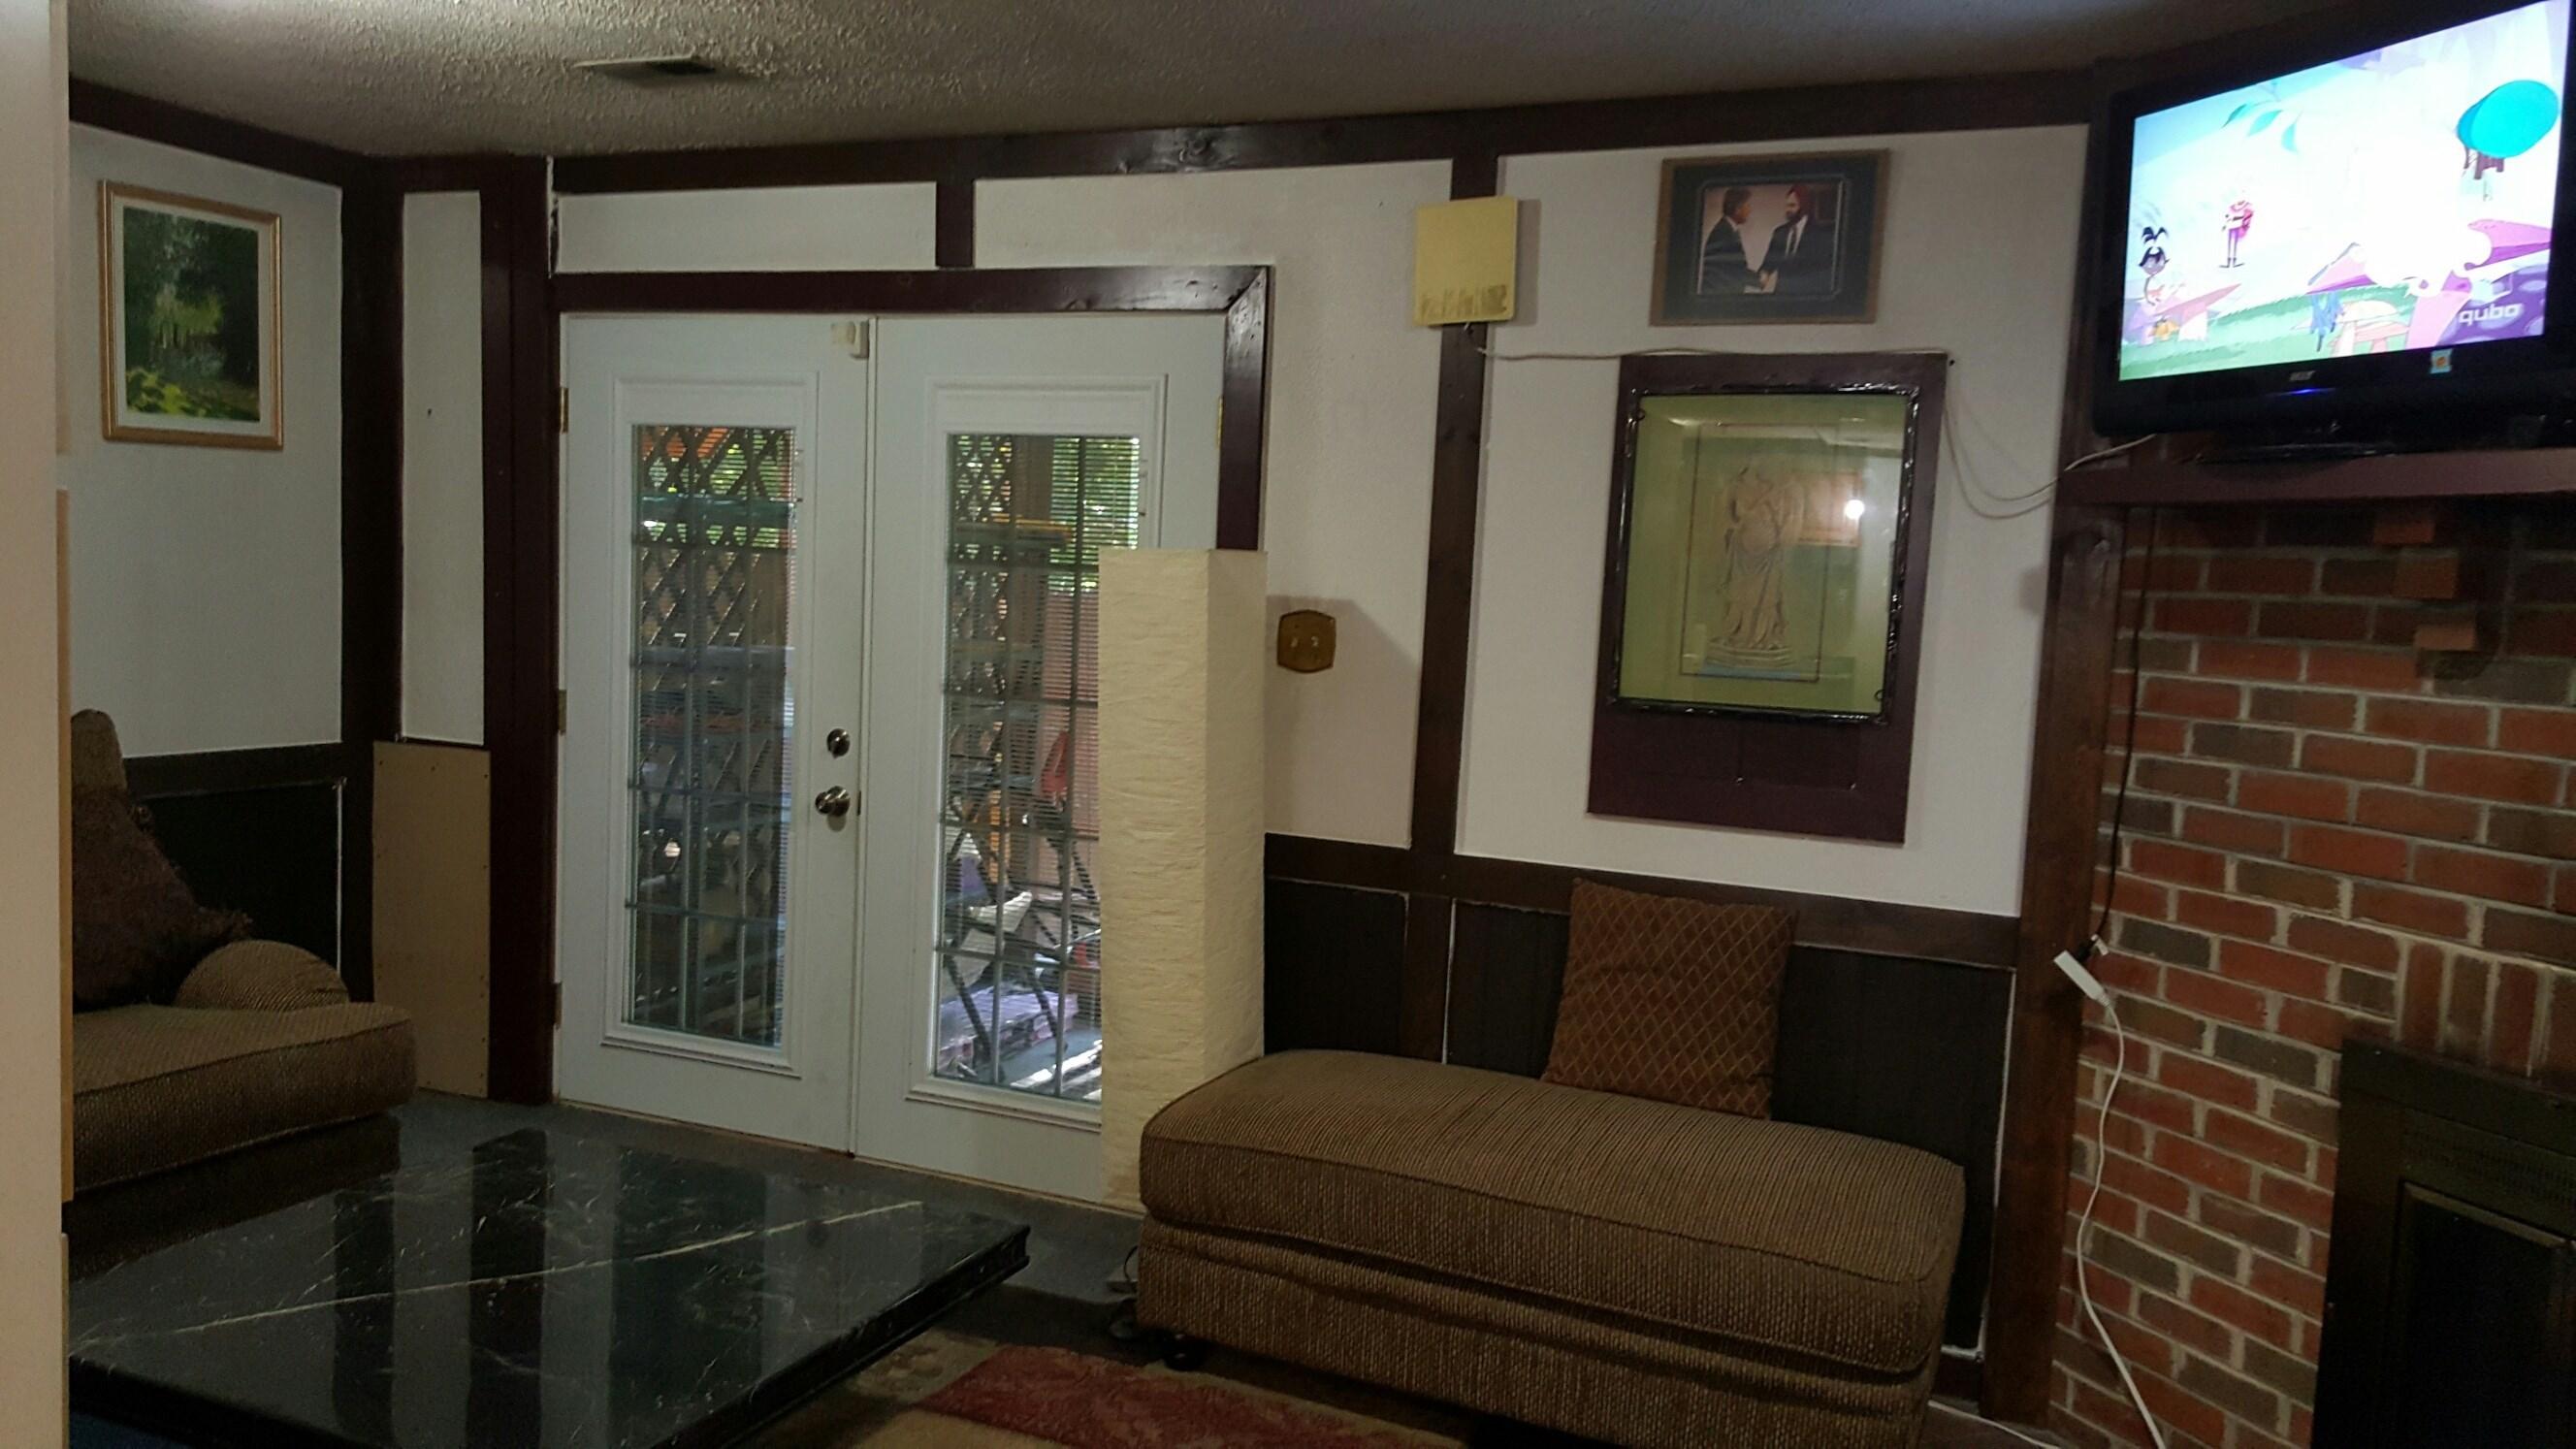 ... Furnished Basement Studio For Rent In Silver Spring   Image 2 ...